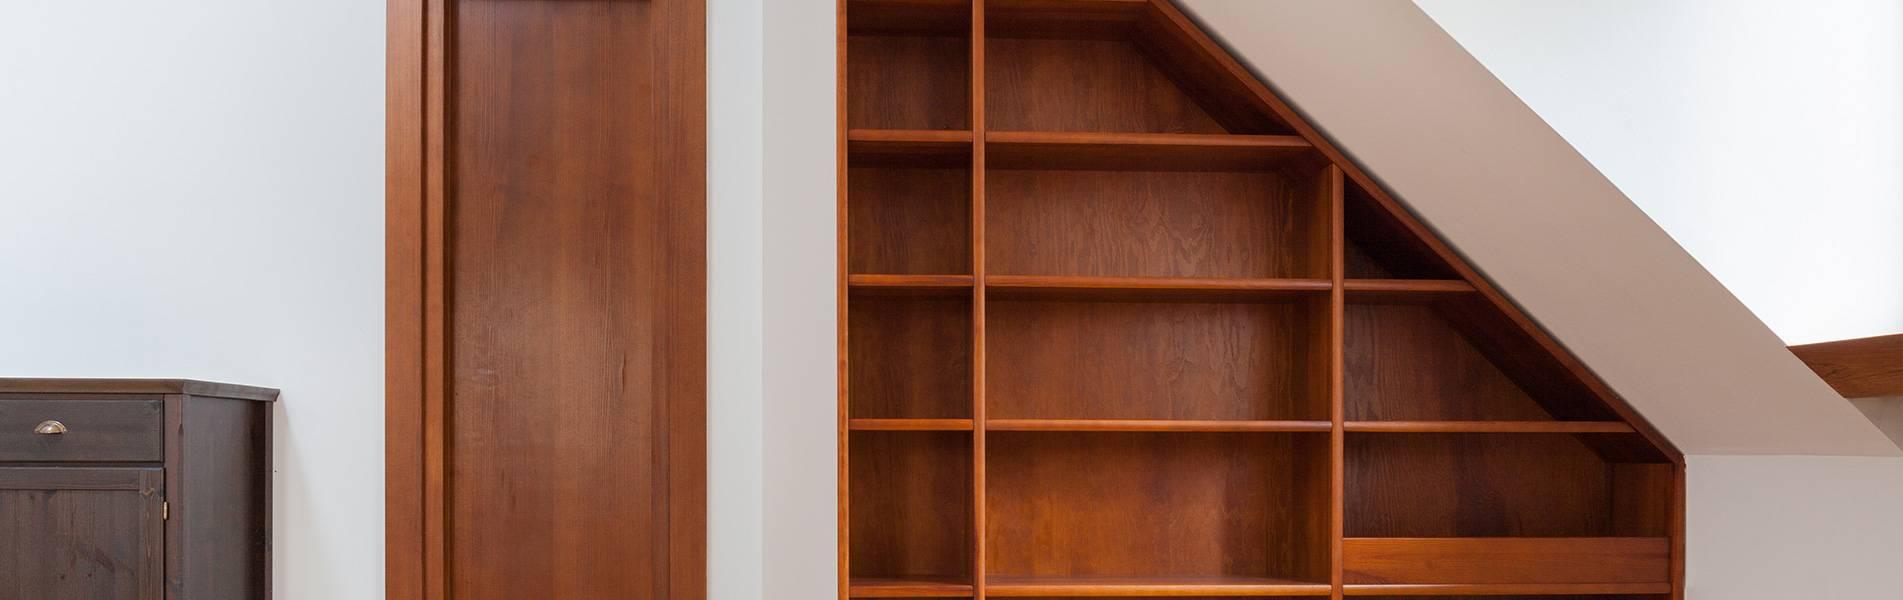 wooden shelf unit in top floor room of house joinery